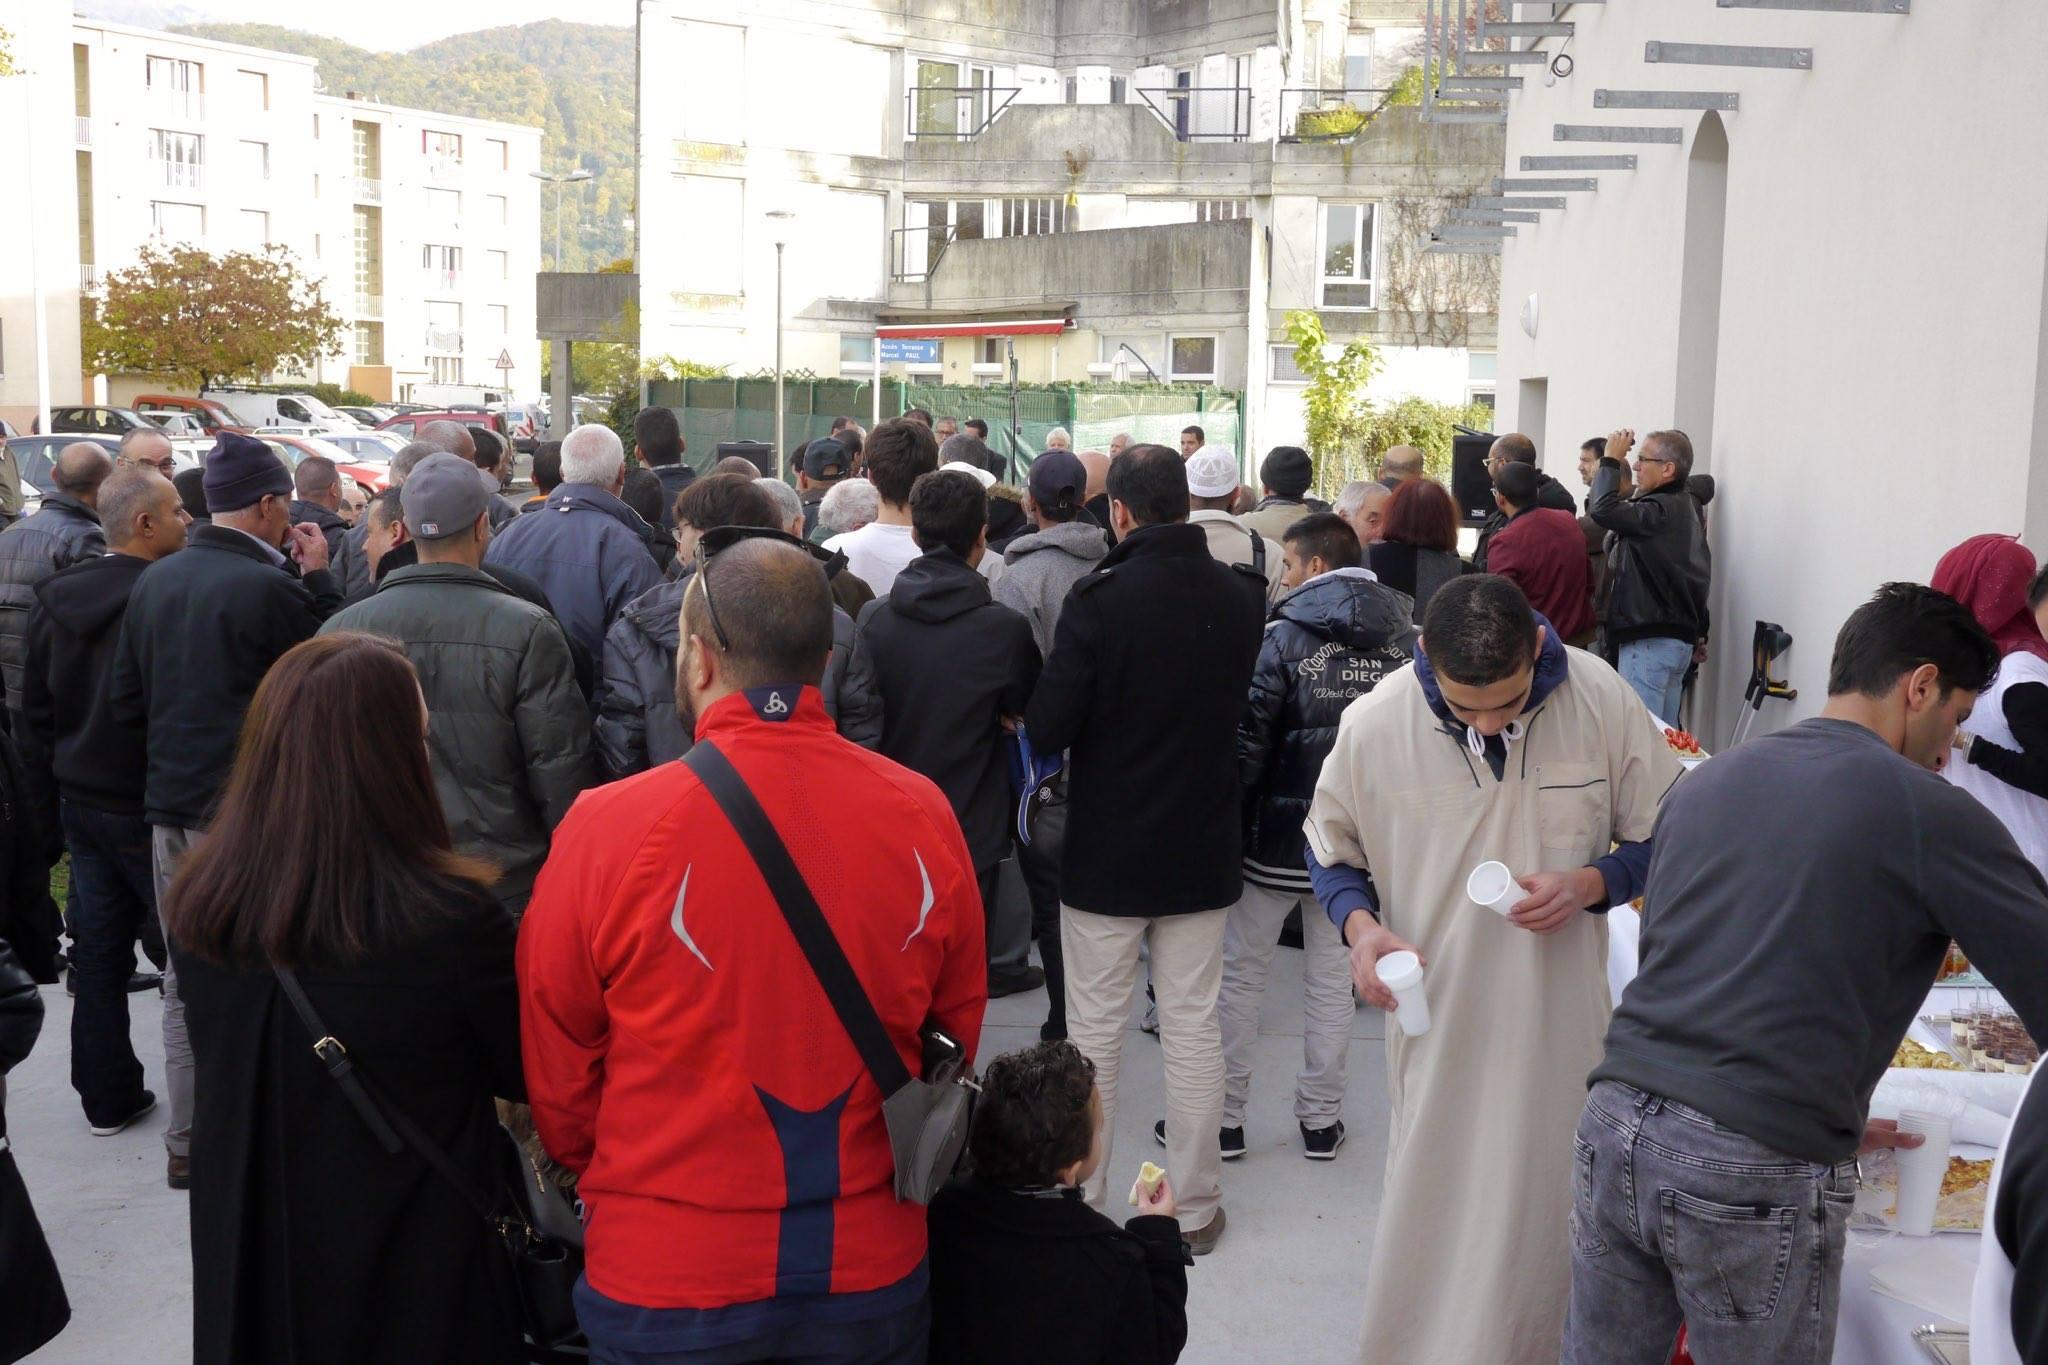 Inauguration de la mosquée Omar de Saint-Martin-d'Hères 2